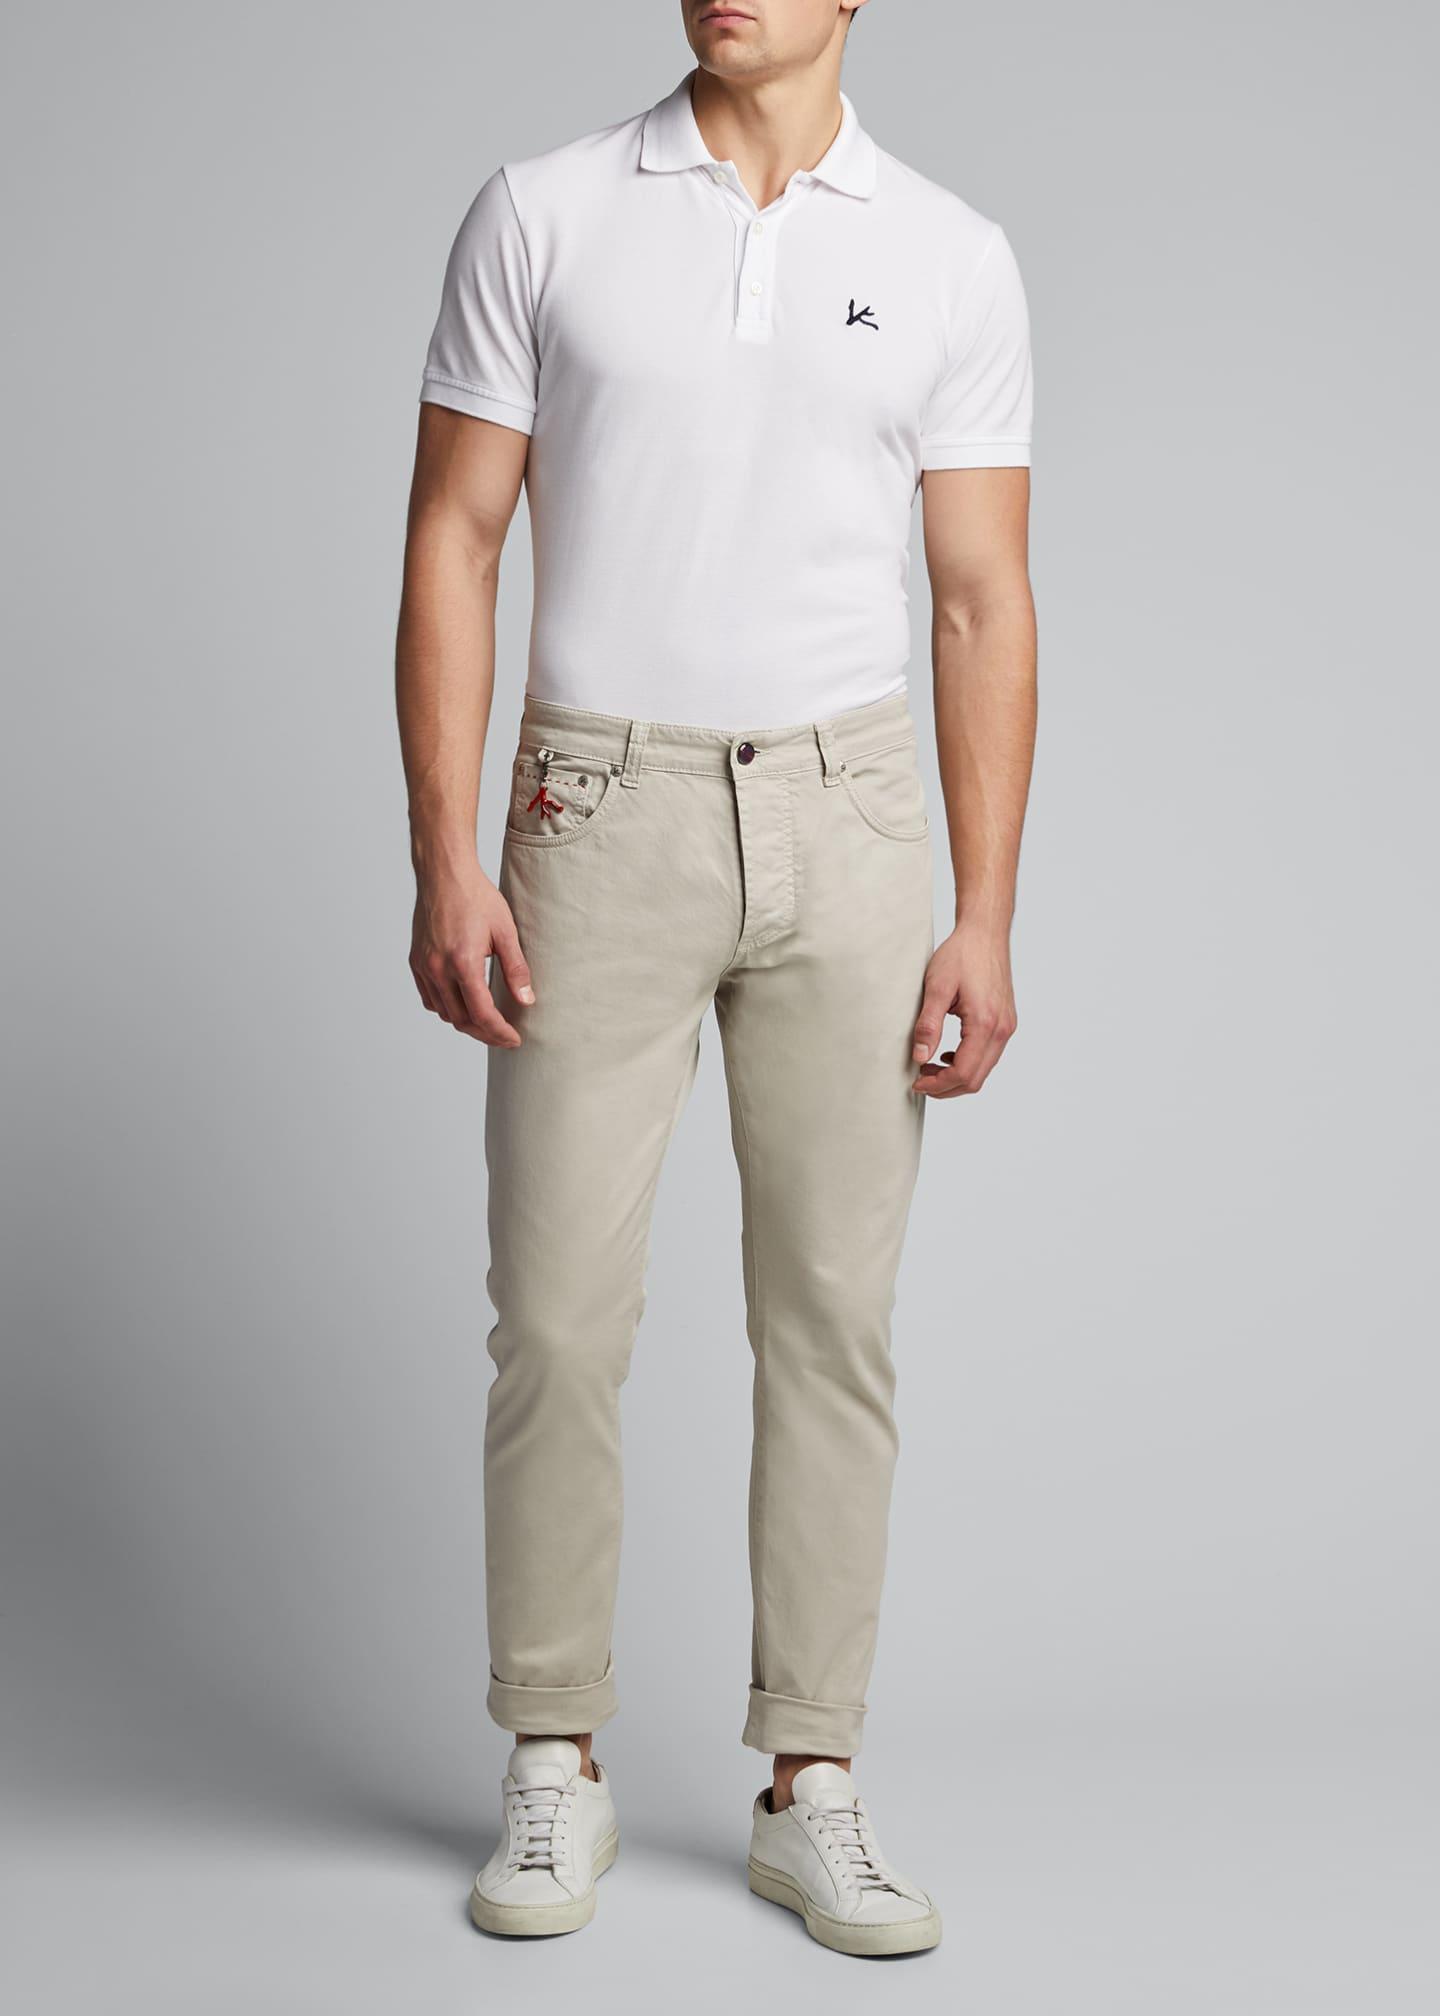 Isaia Men's Stretch-Denim Jeans